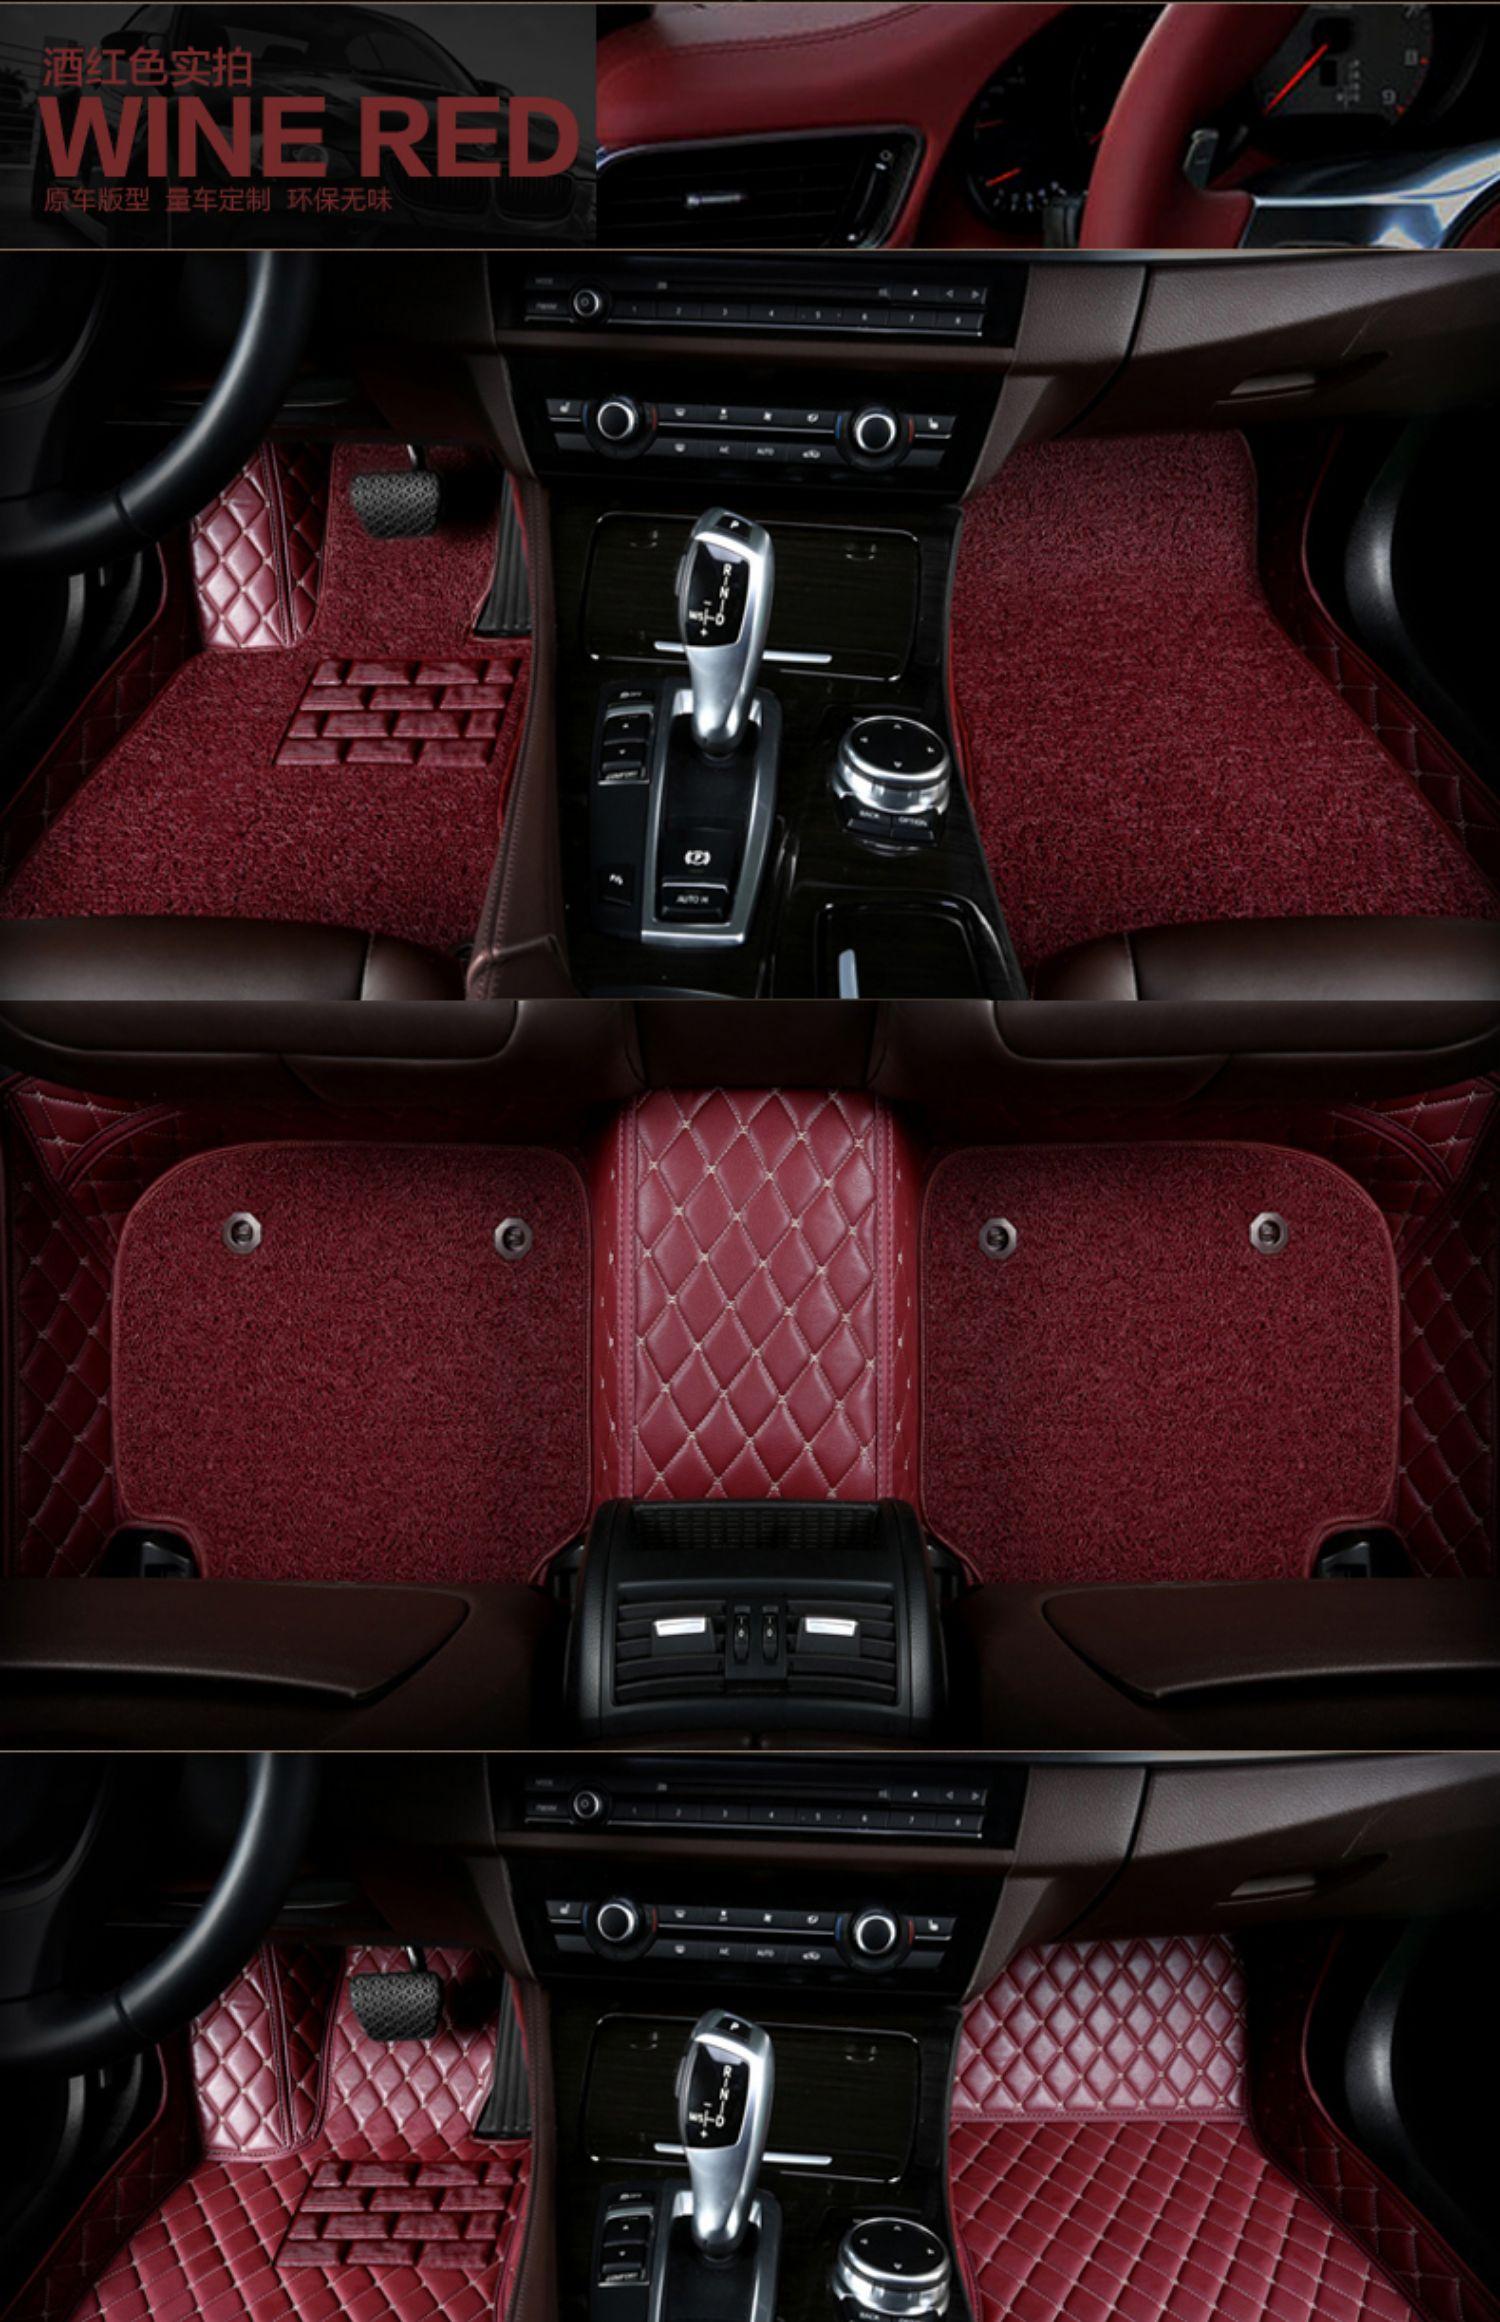 2019款全包围脚垫奥迪A4L Q3 Q5L A3 A6L Q5 A1 TT Q7 A8汽车地毯商品详情图